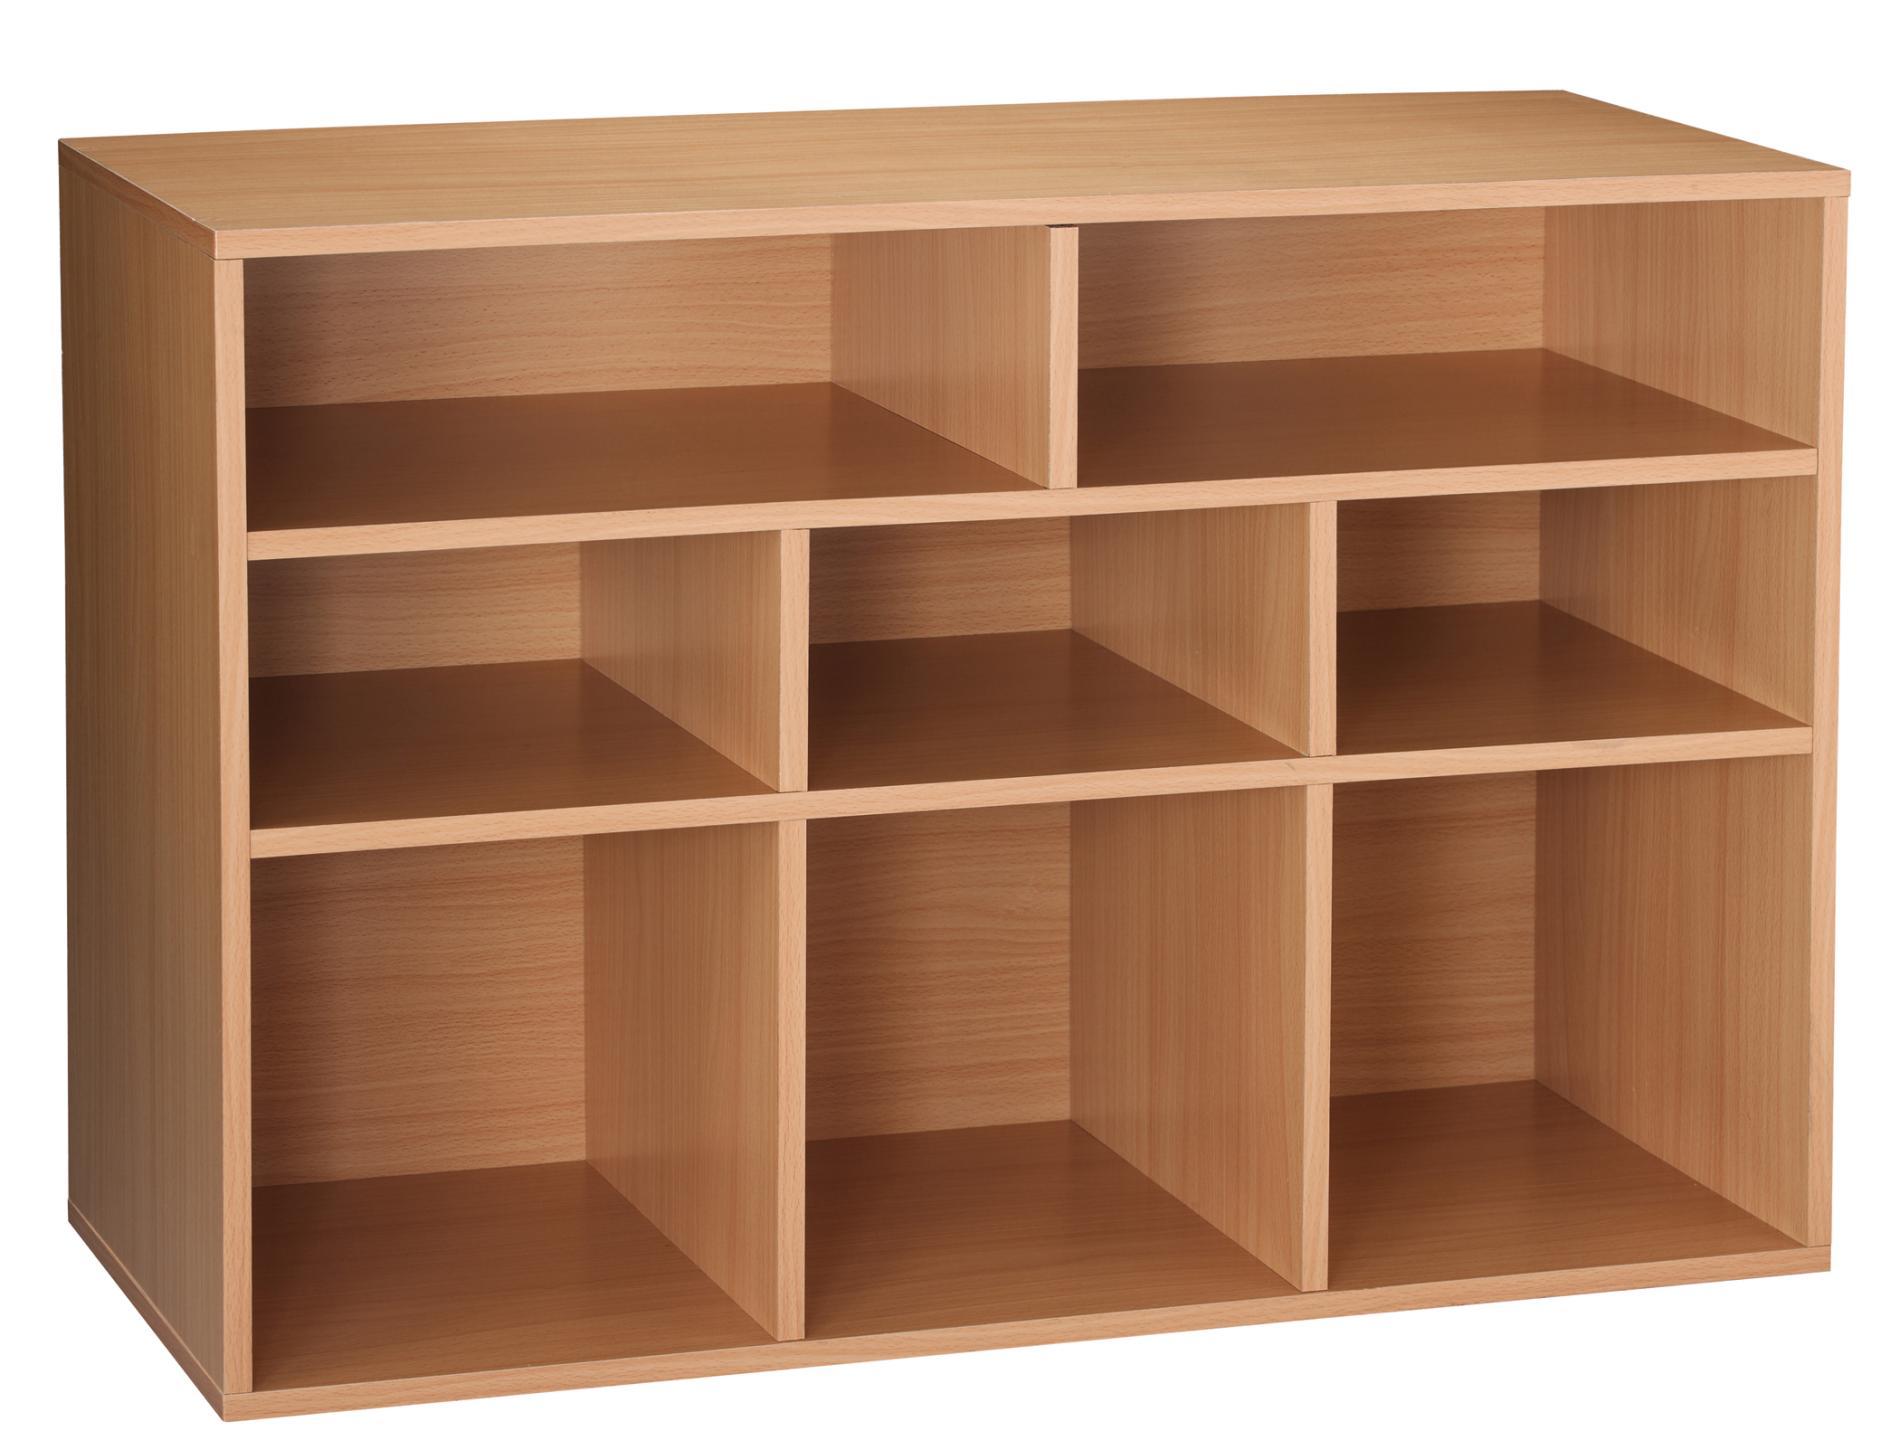 8 Cube Oak Finish Storage Unit Versatile Home Organizer